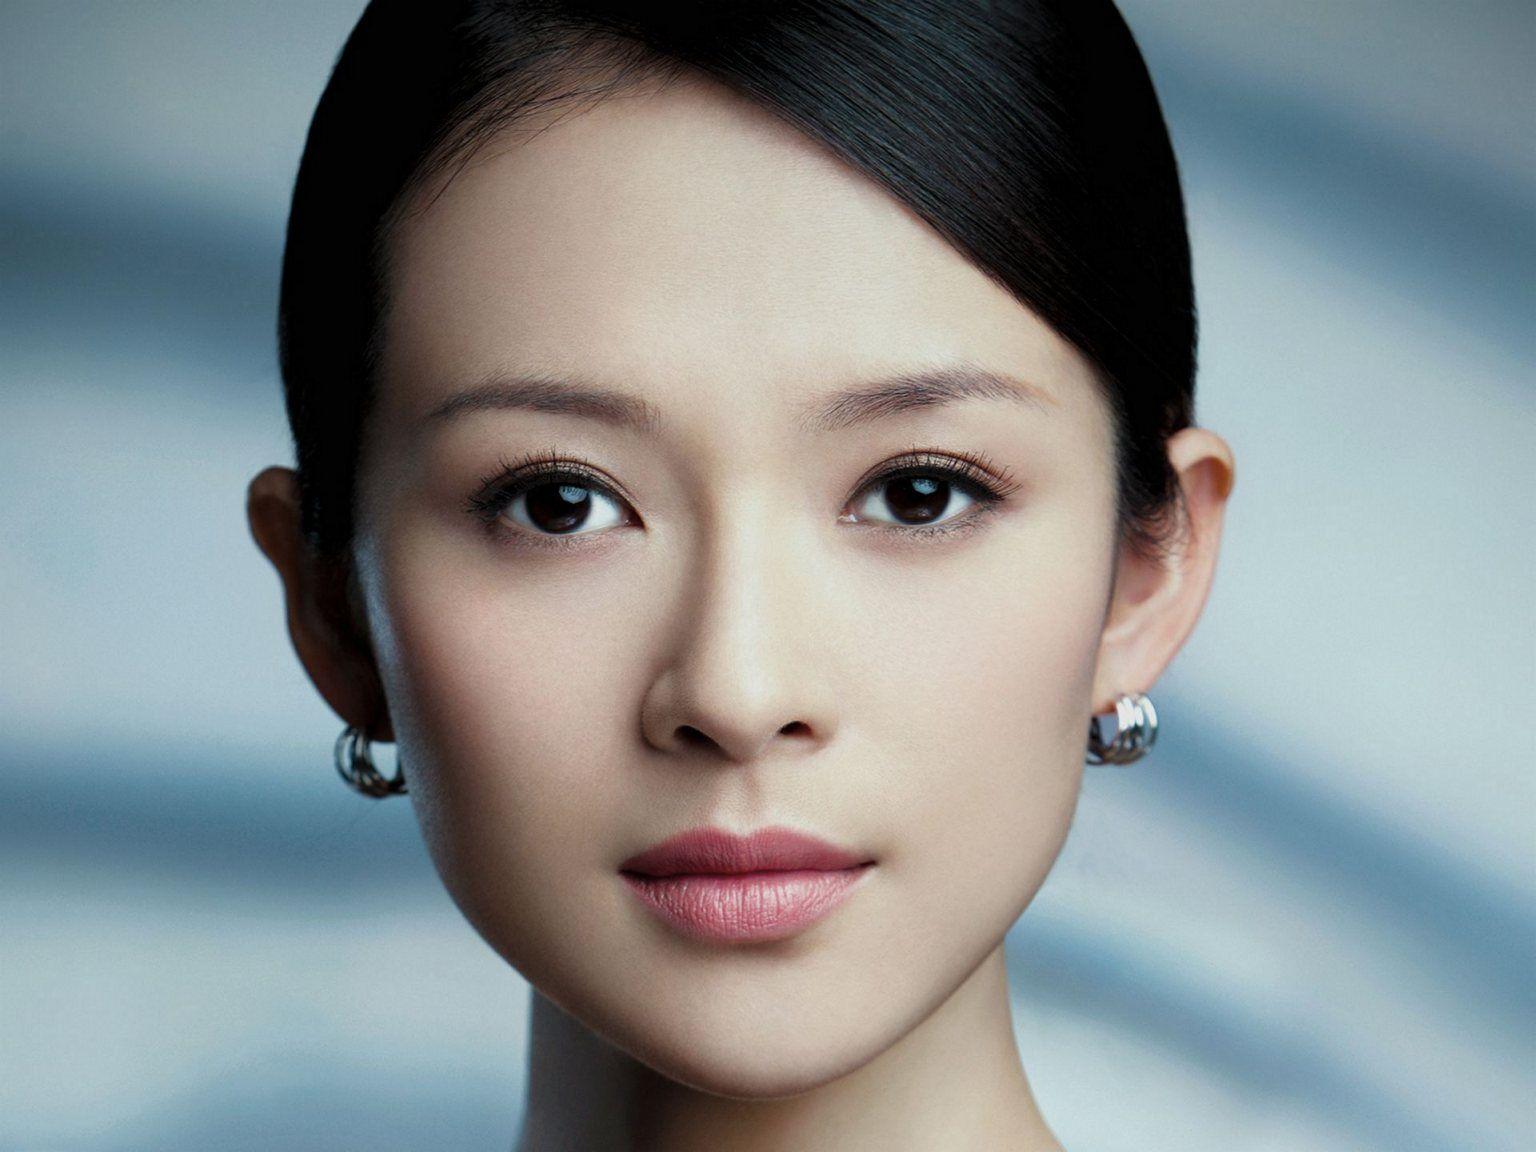 ziyi zhang facebook